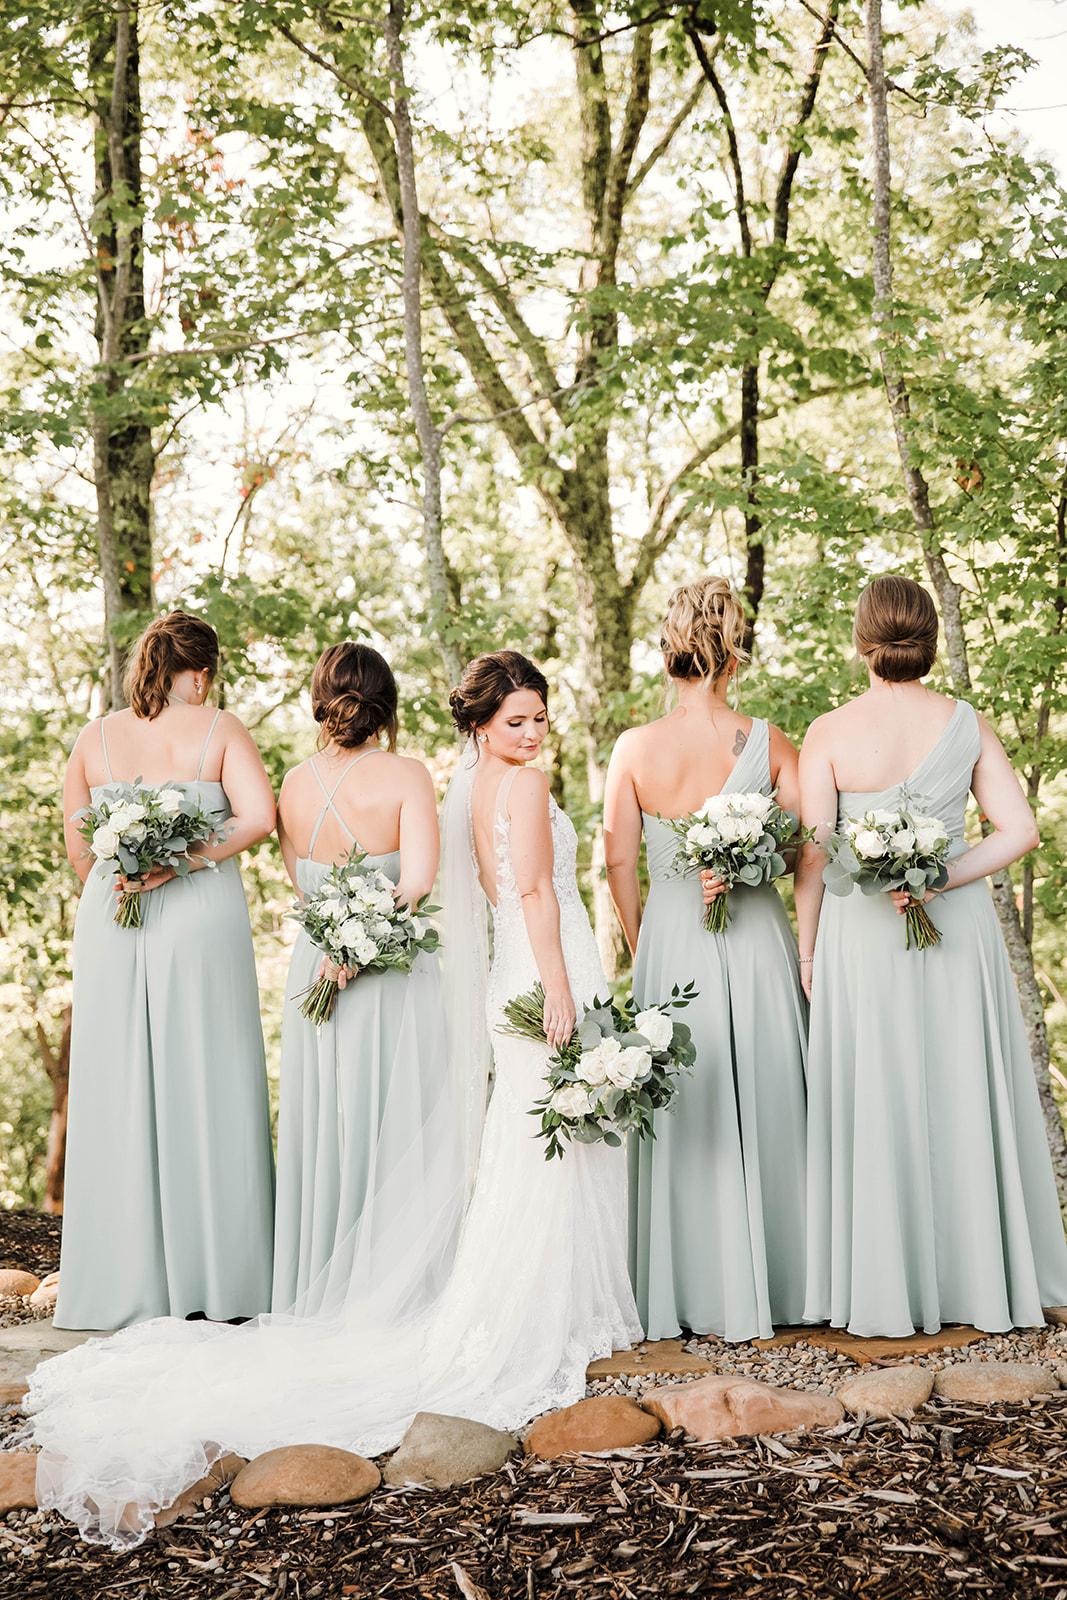 bride looking over her shoulder with bridesmaids